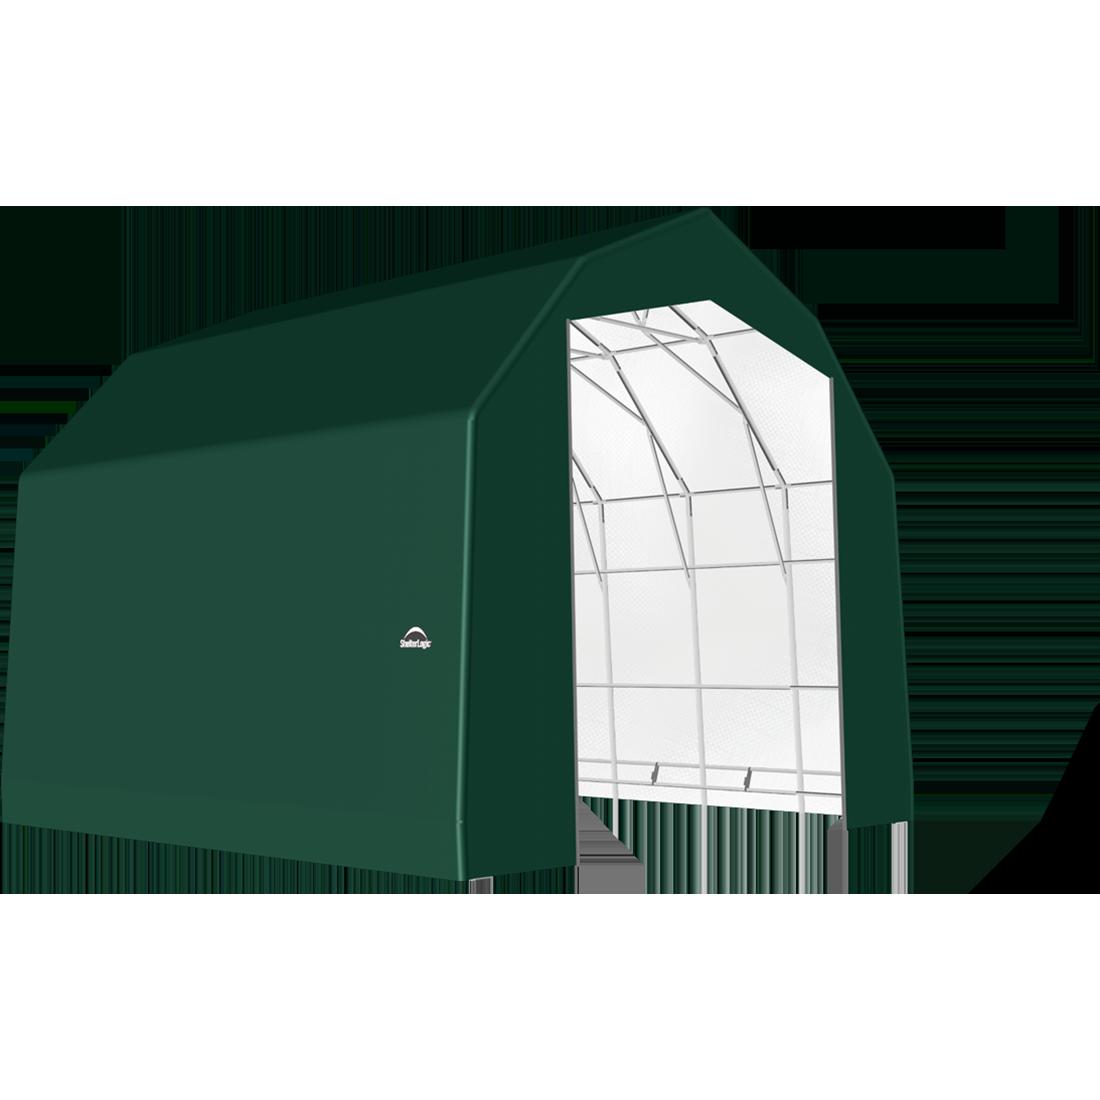 SP Barn 25X24X20 Green 14 oz PE Shelter